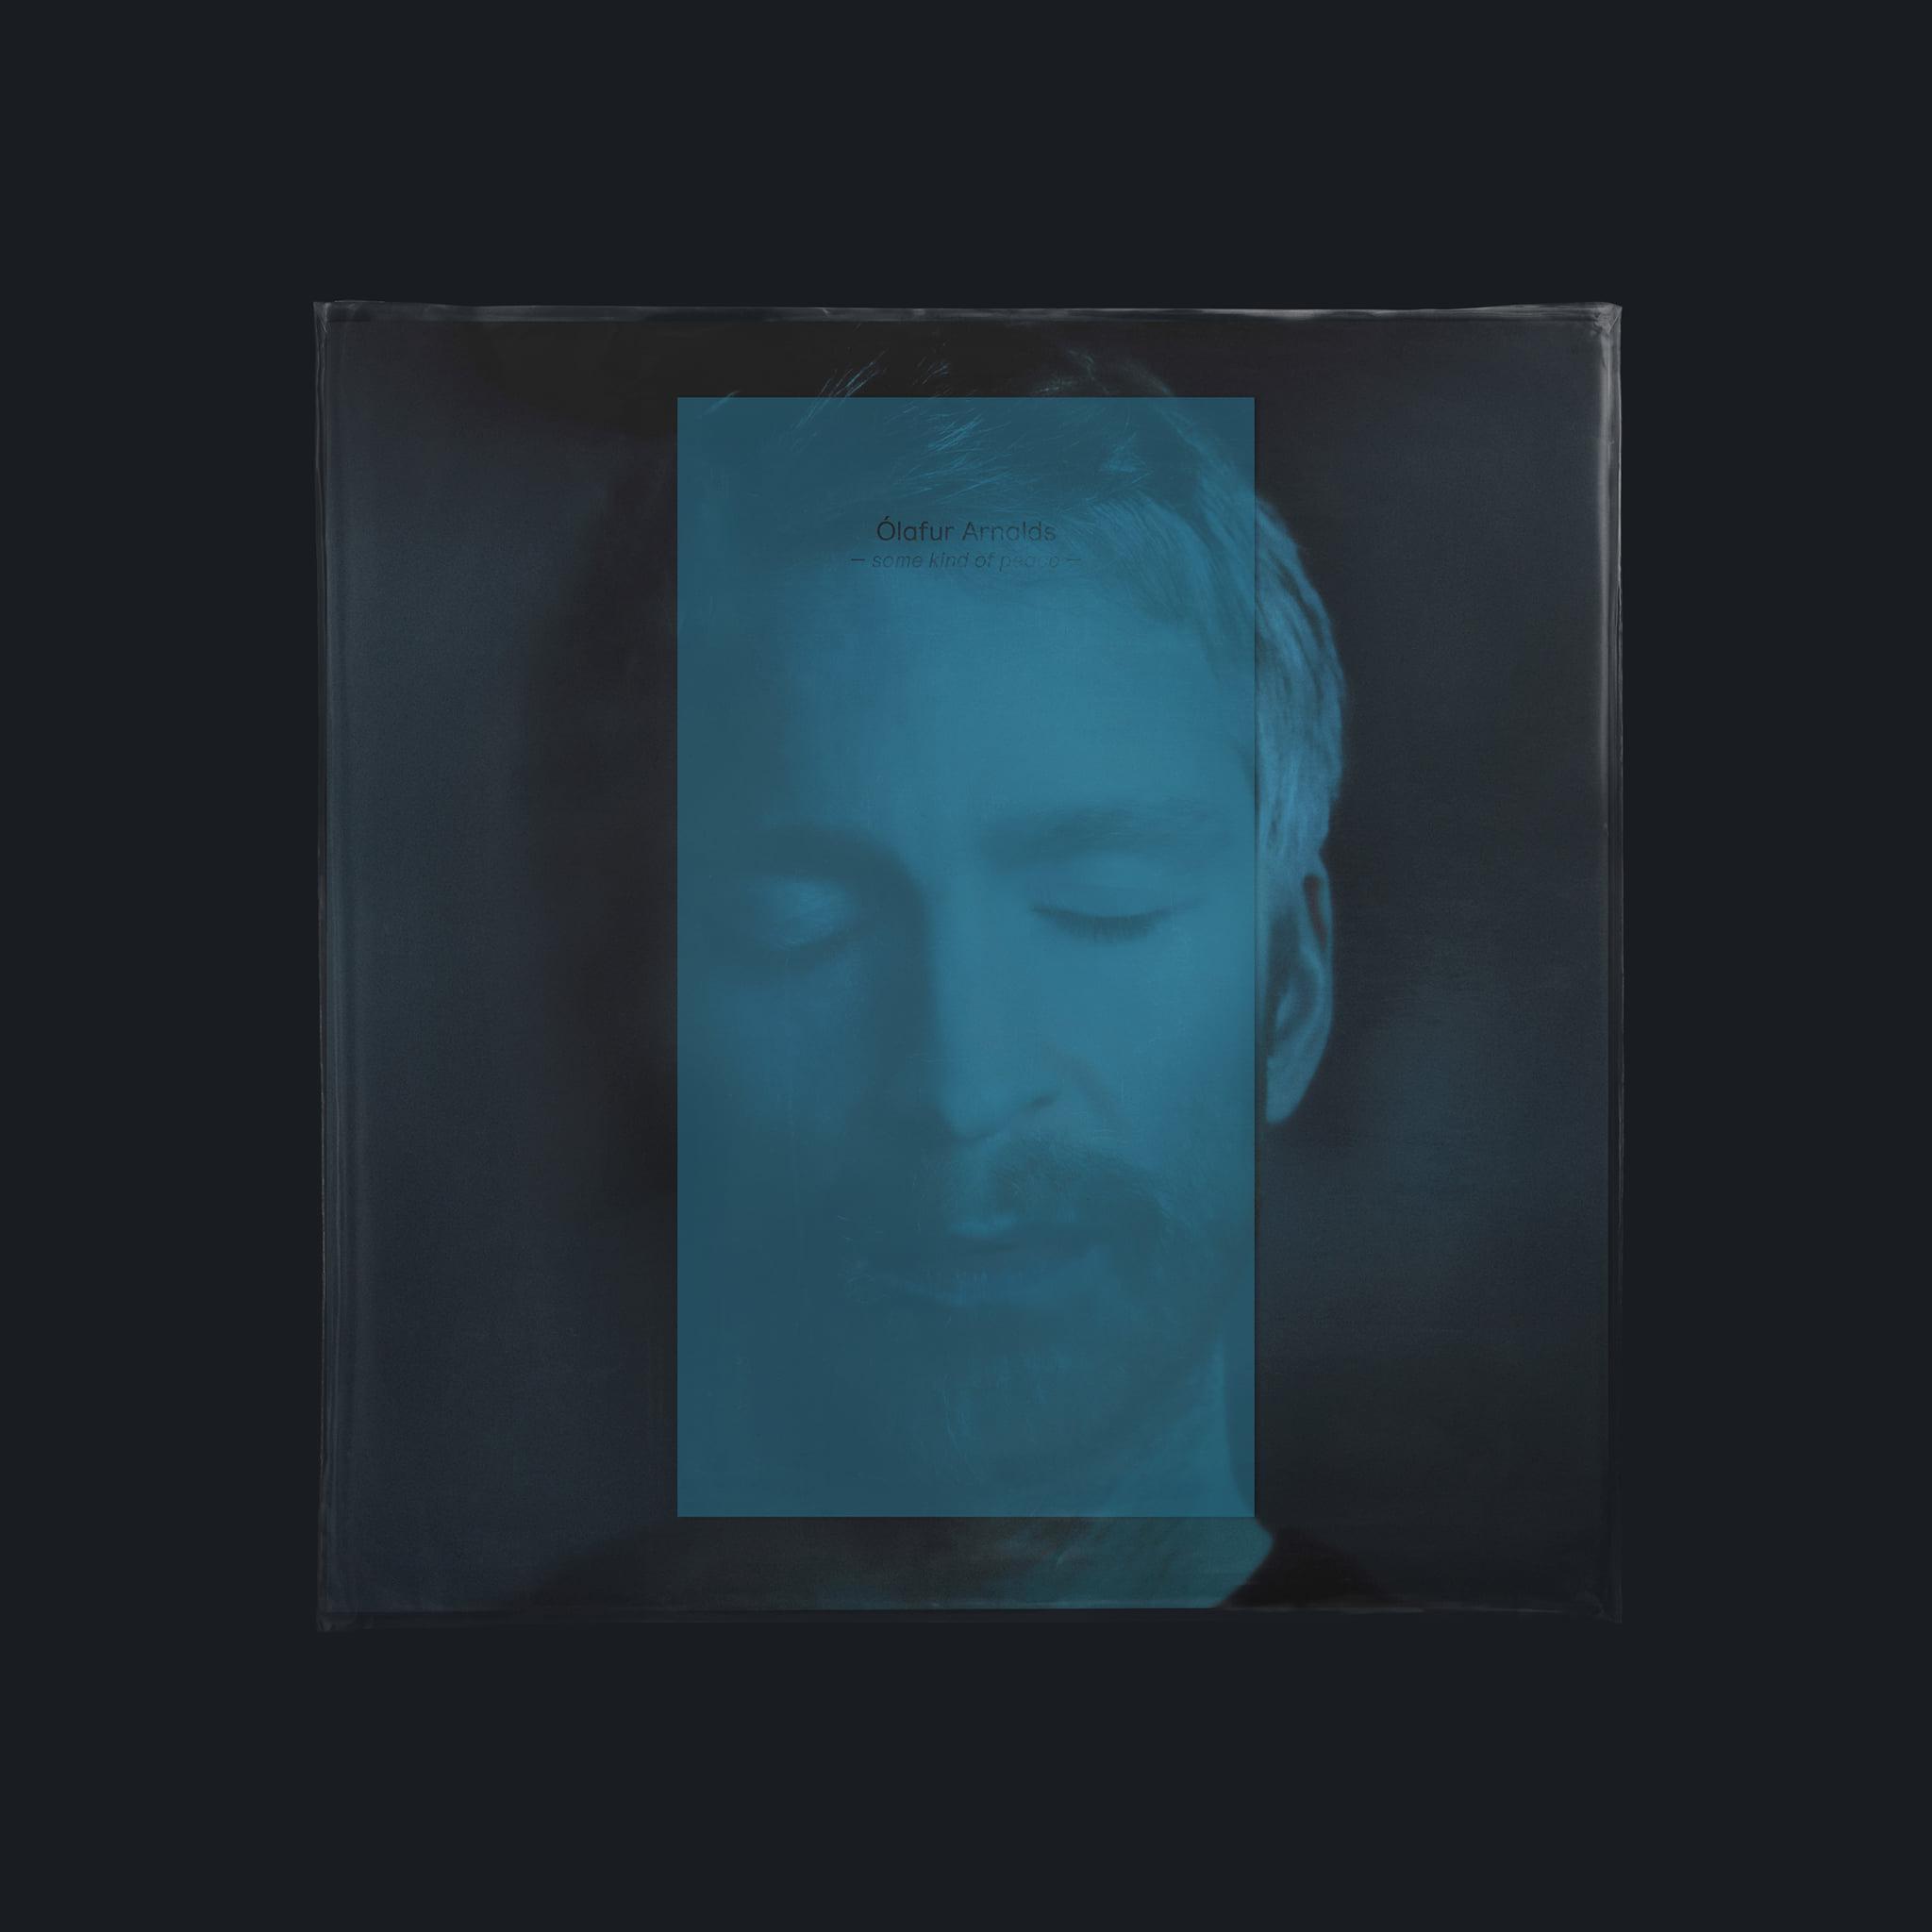 Ólafur Arnalds - Some Kind Of Peace - okładka albumu